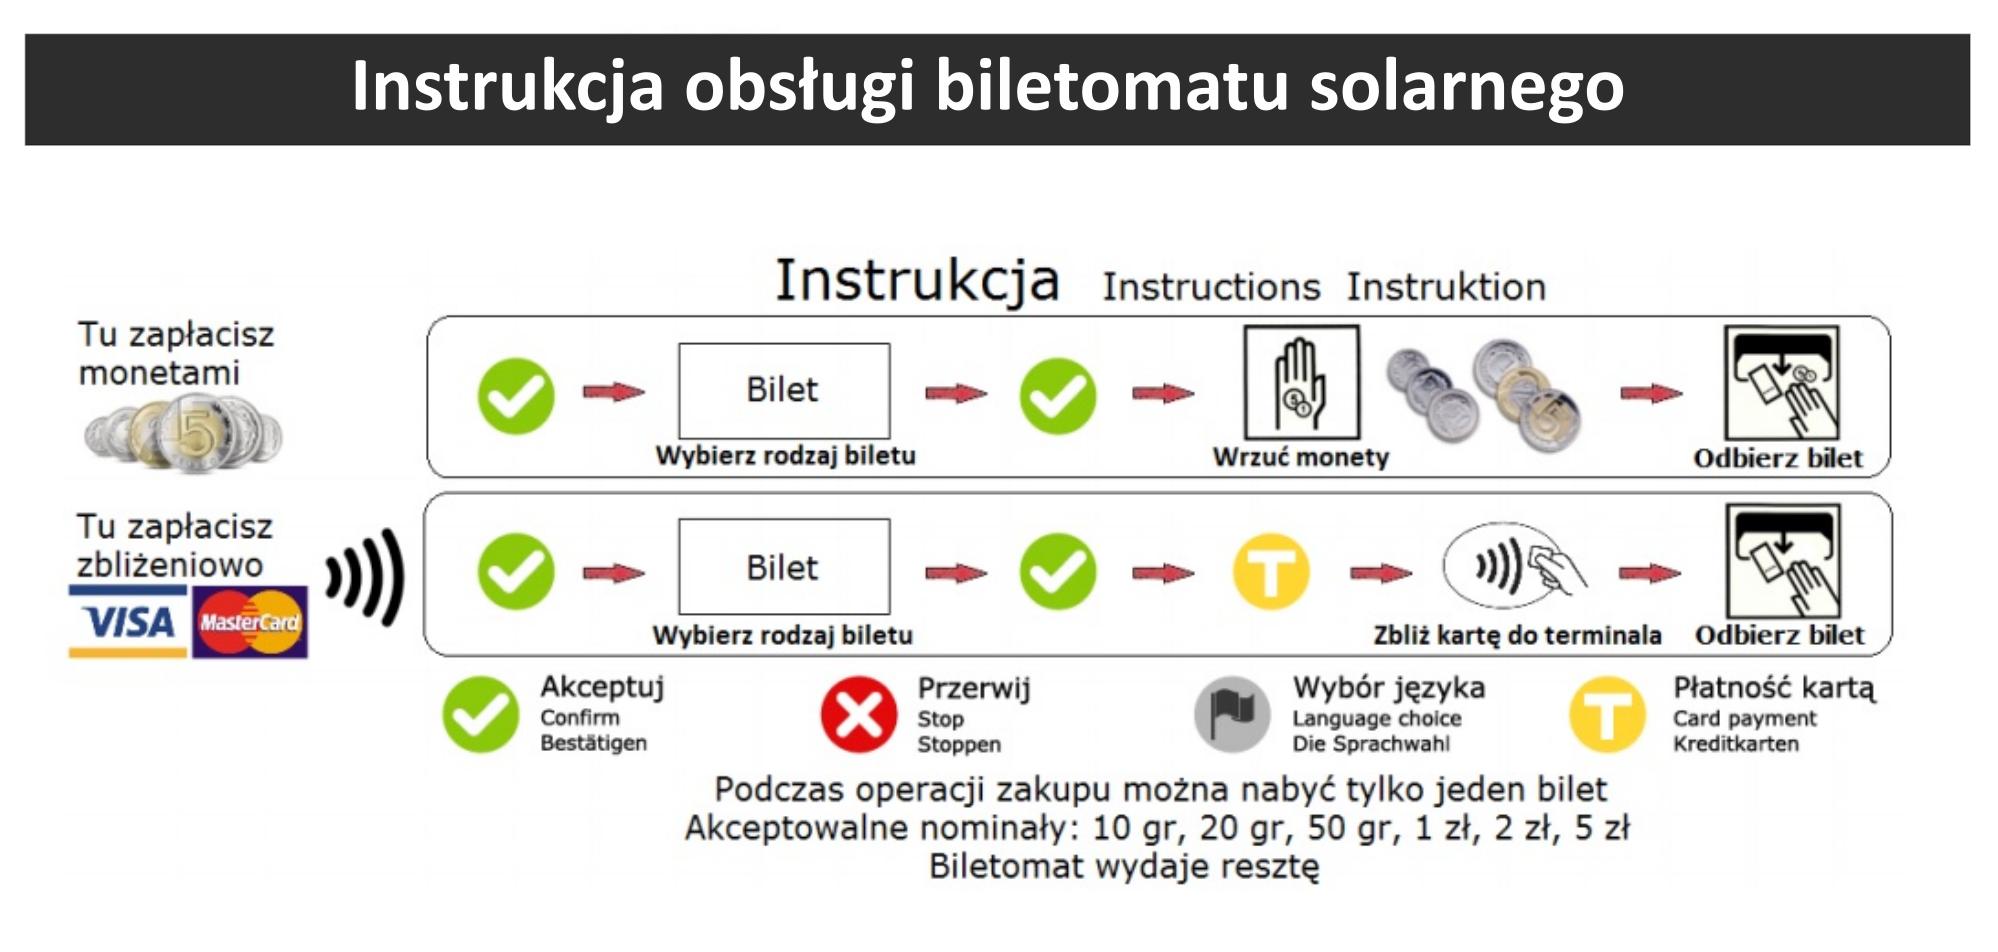 biletomat instrukcja solar